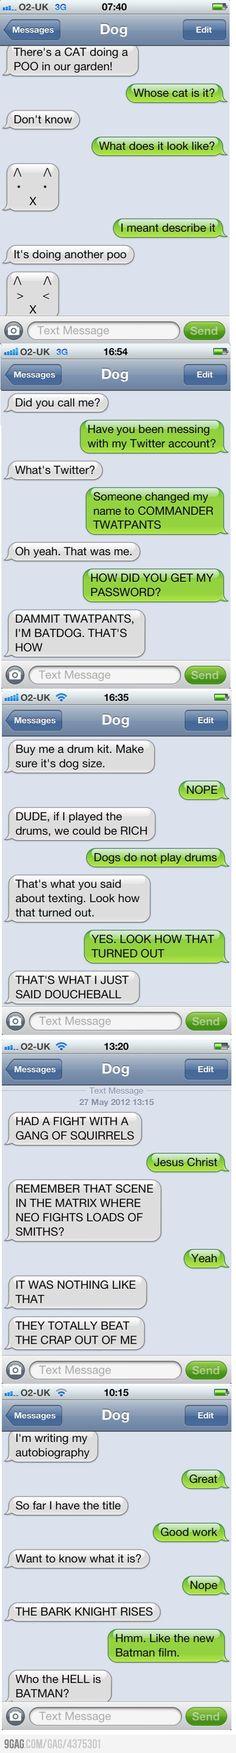 Texts from dog hahahahahhahahahahahahahahahhahaha